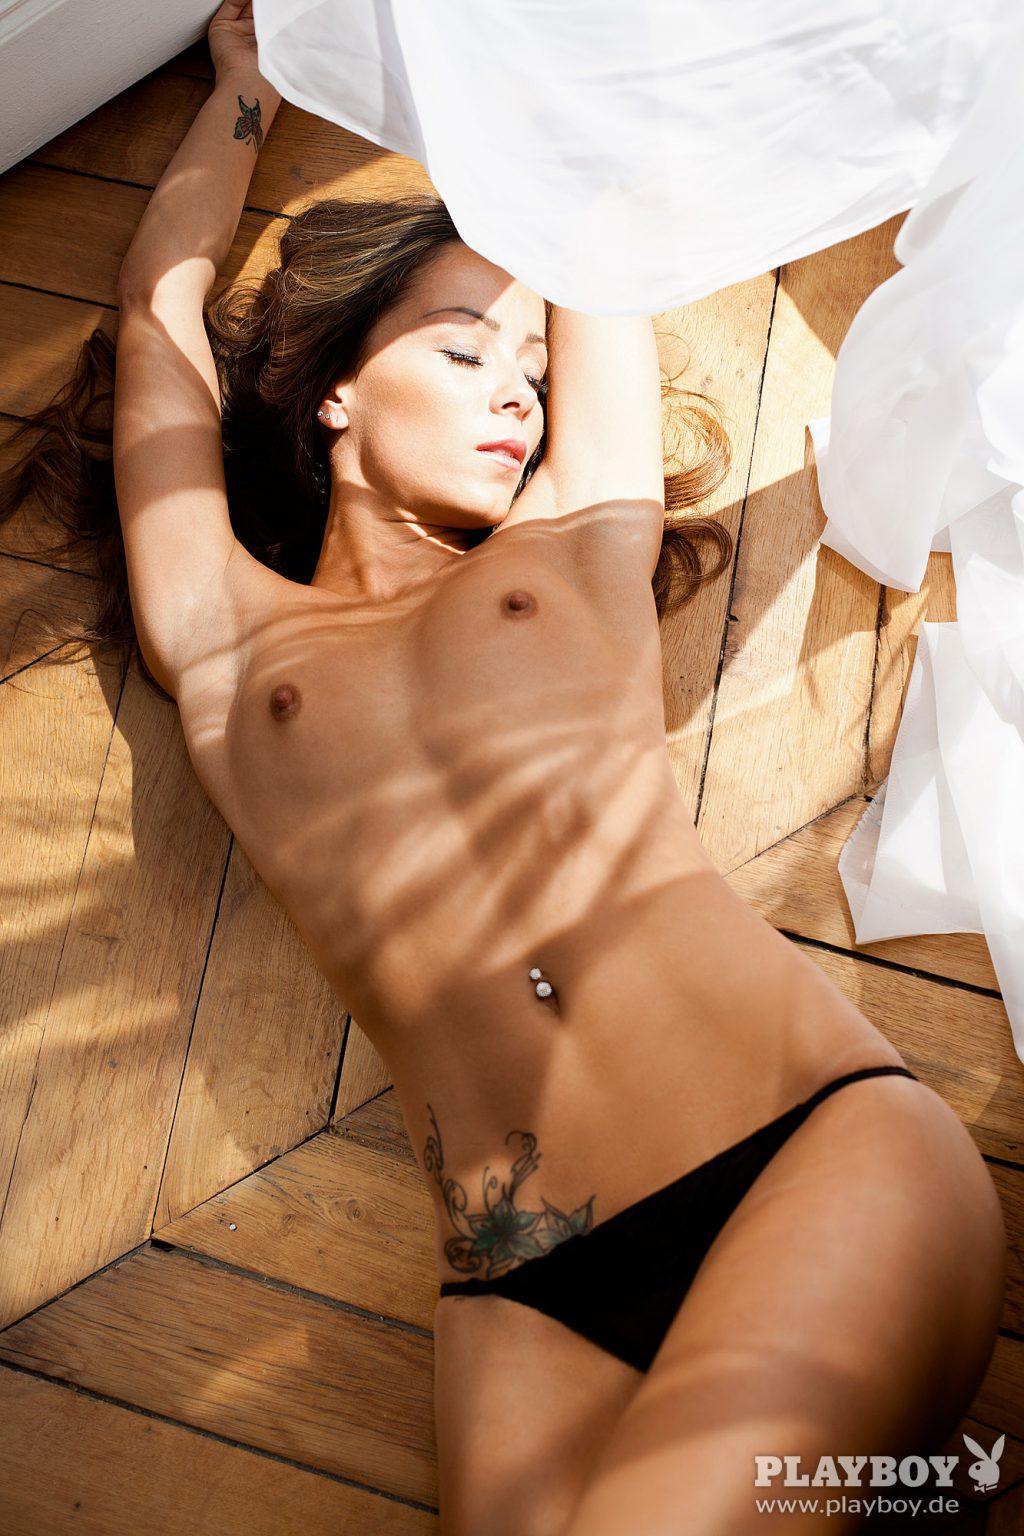 Nathalie Cassegrain Nude – Playboy (30 Photos)